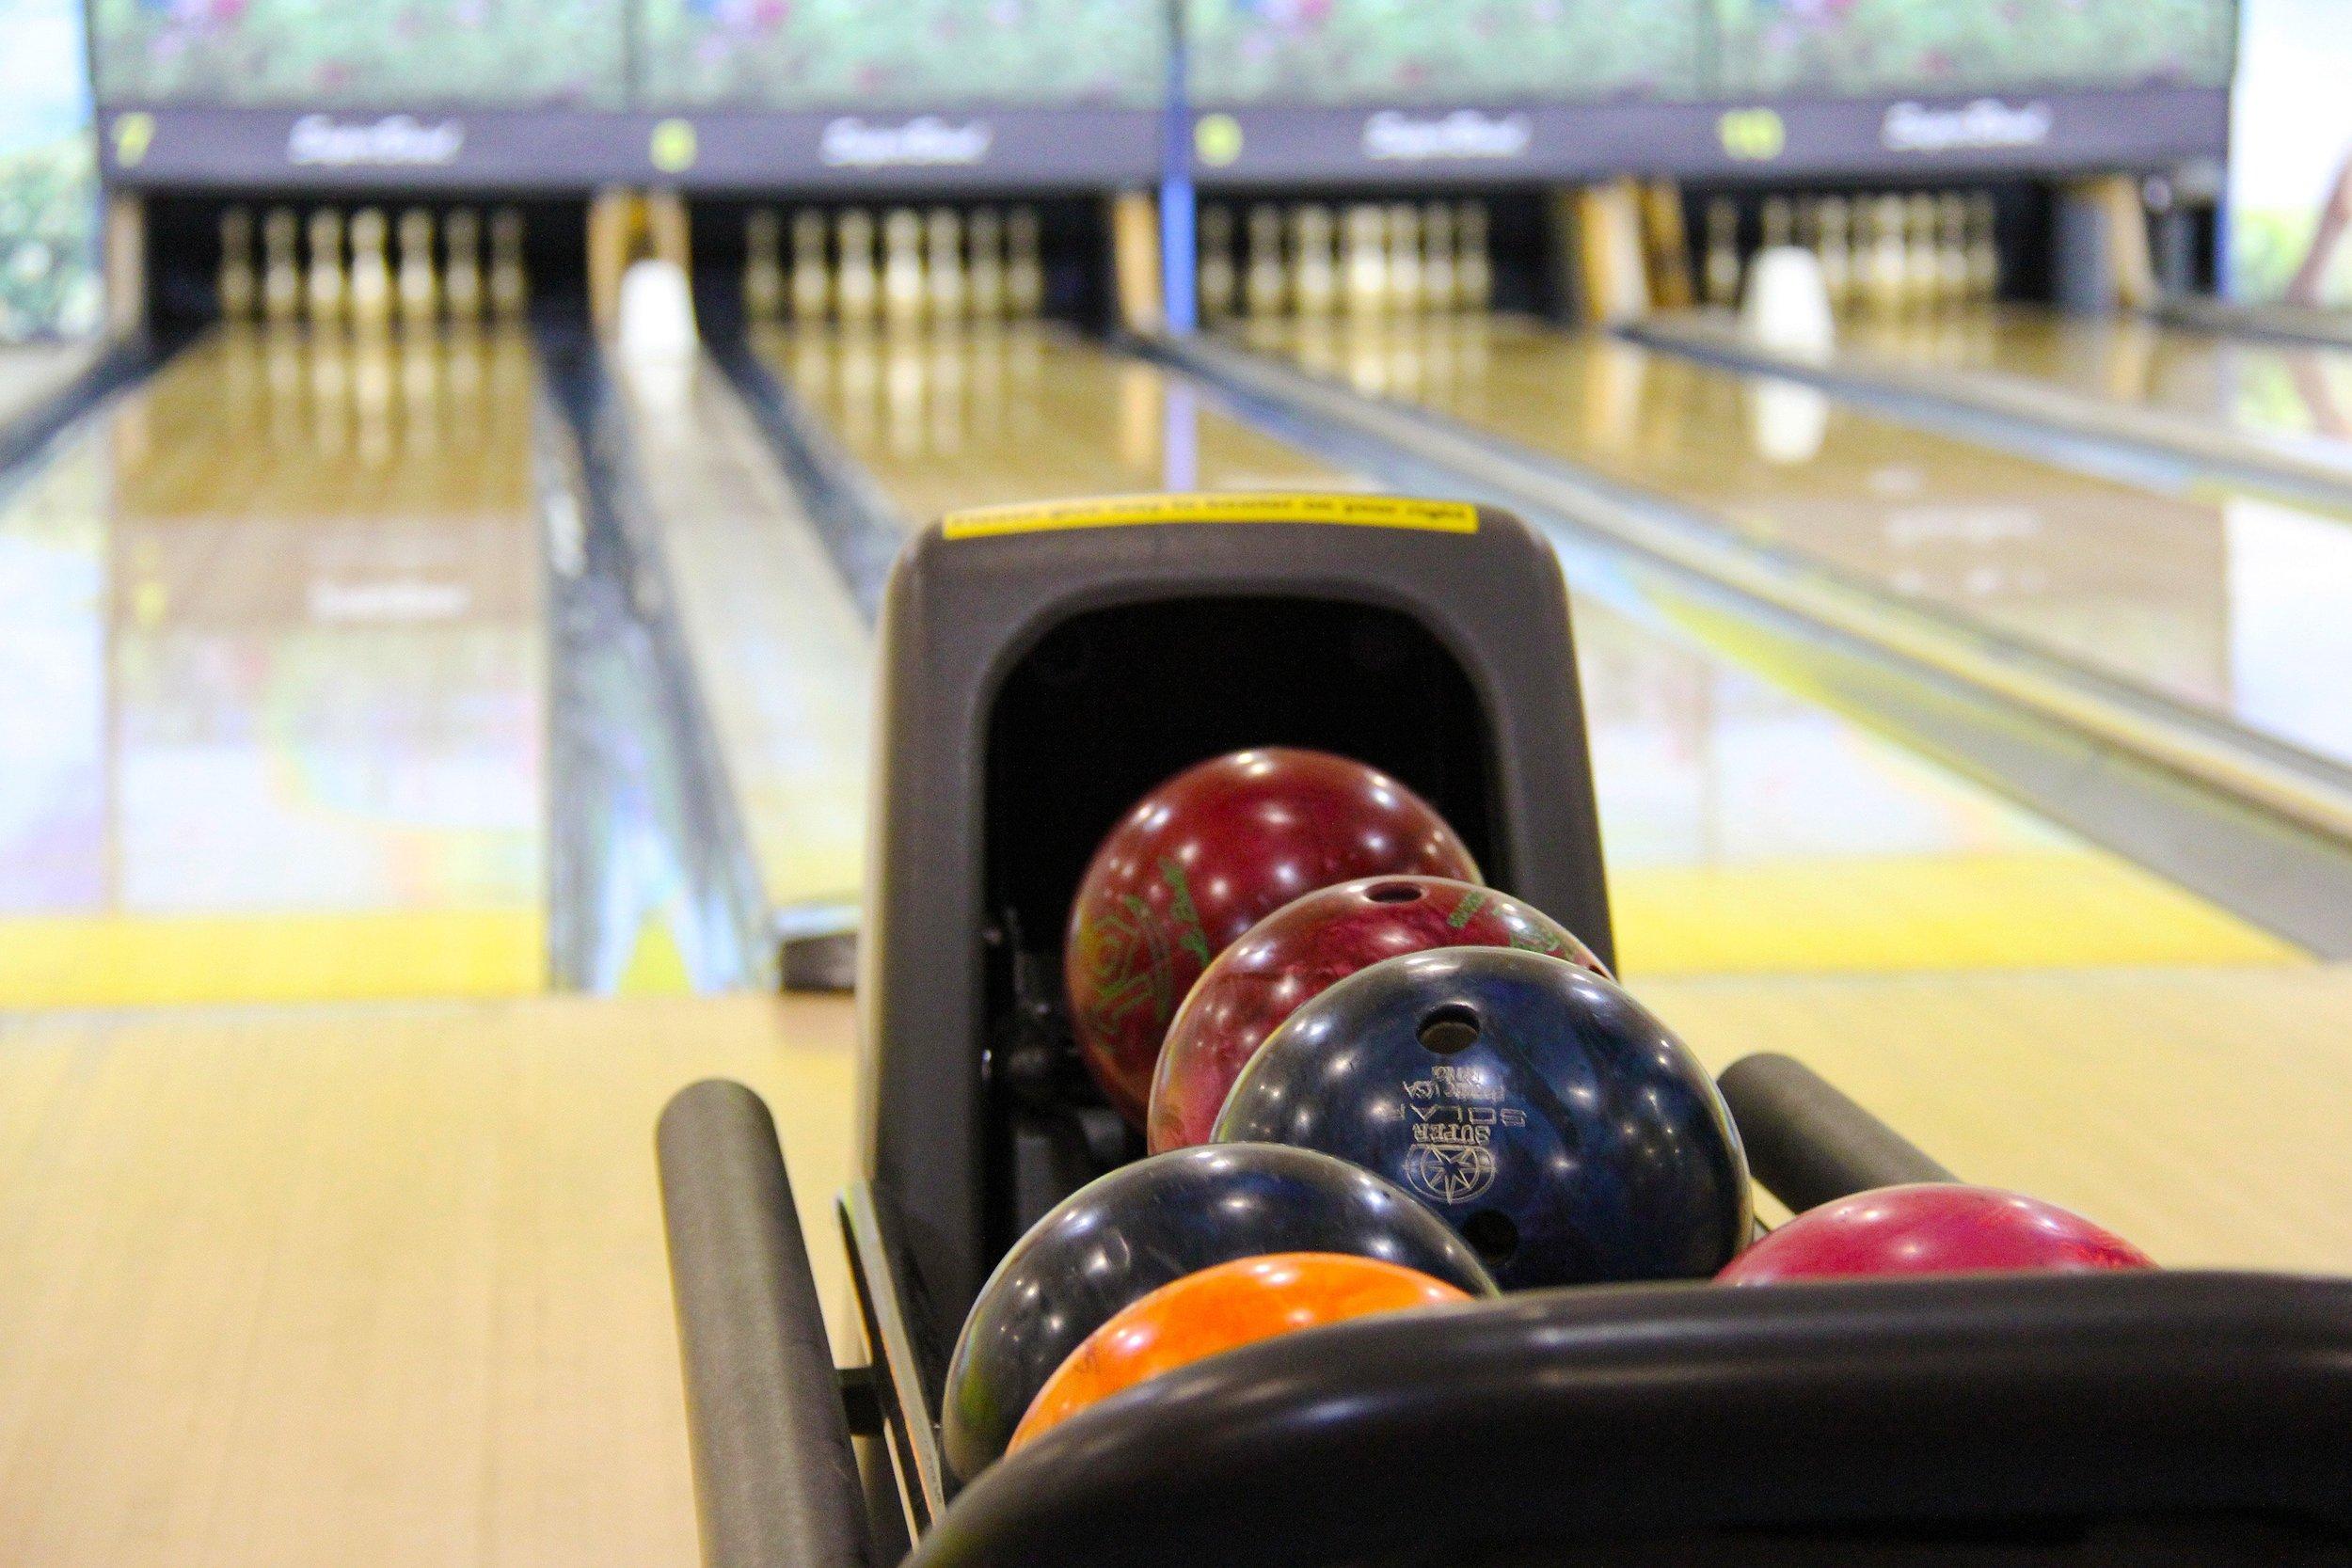 bowling-bowling-balls-game-53115.jpg